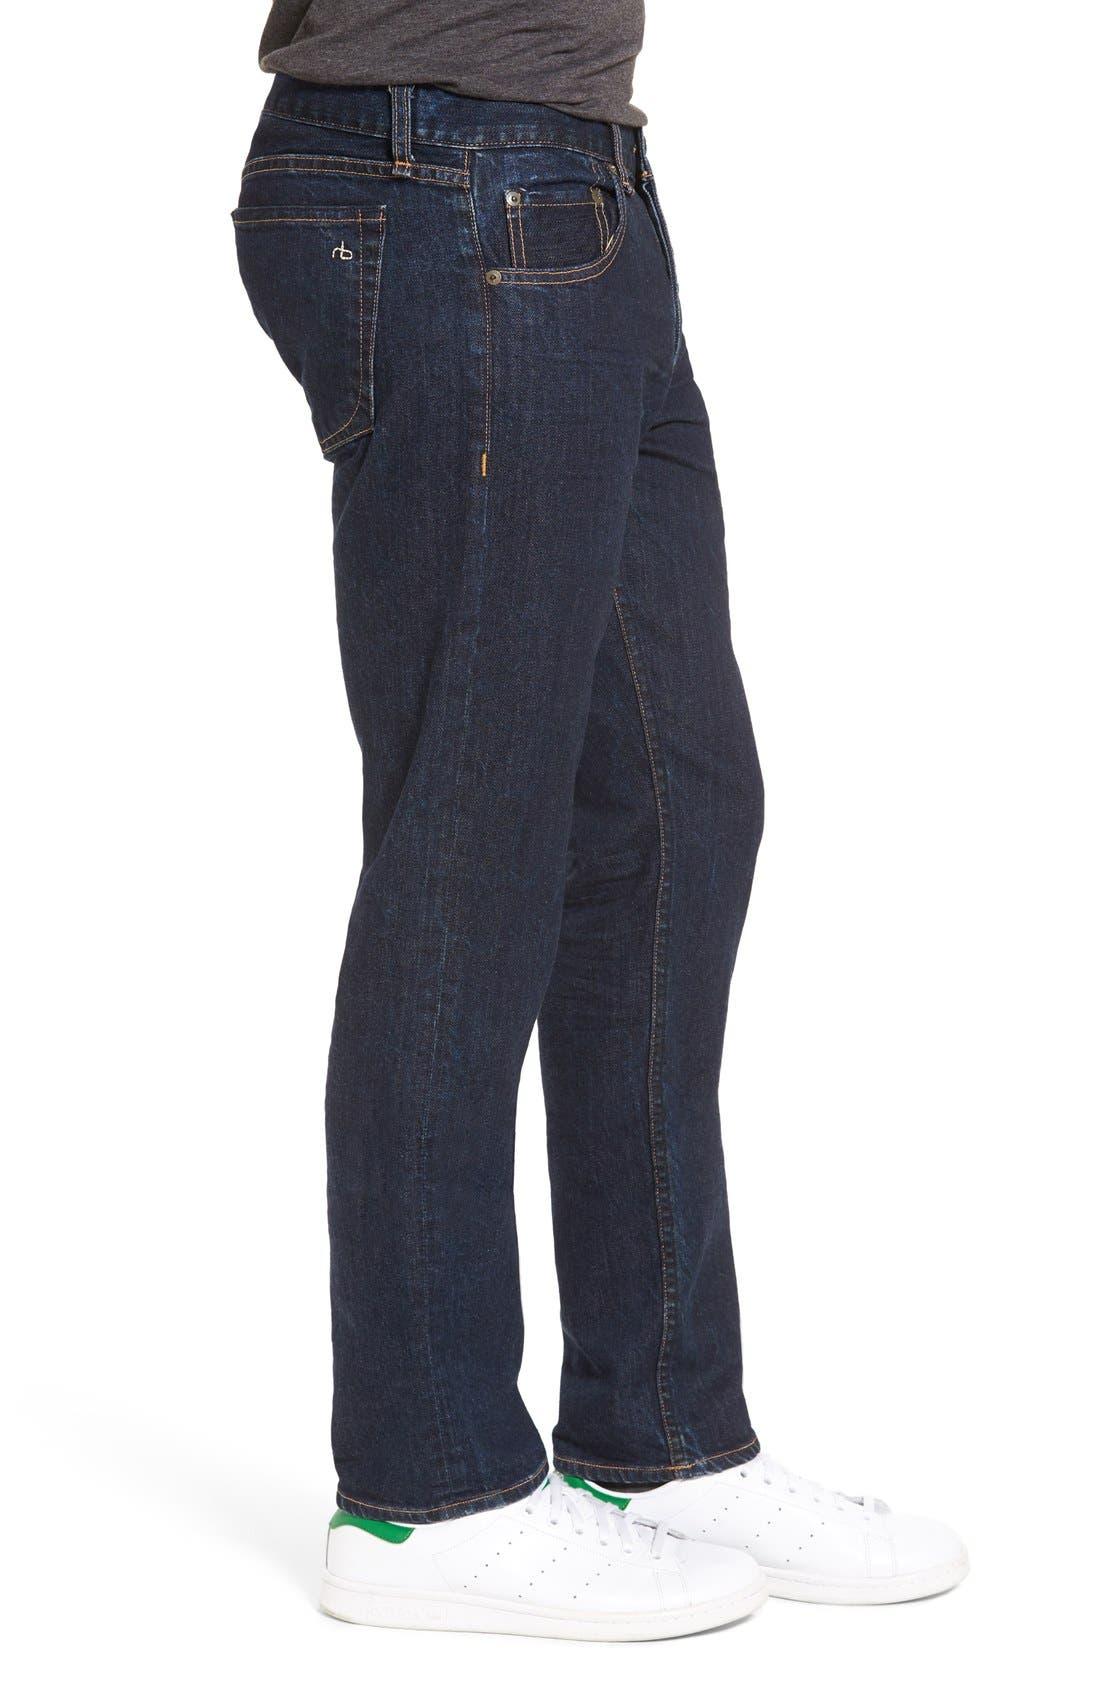 Standard Issue Fit 3 Slim Straight Leg Jeans,                             Alternate thumbnail 9, color,                             HERITAGE